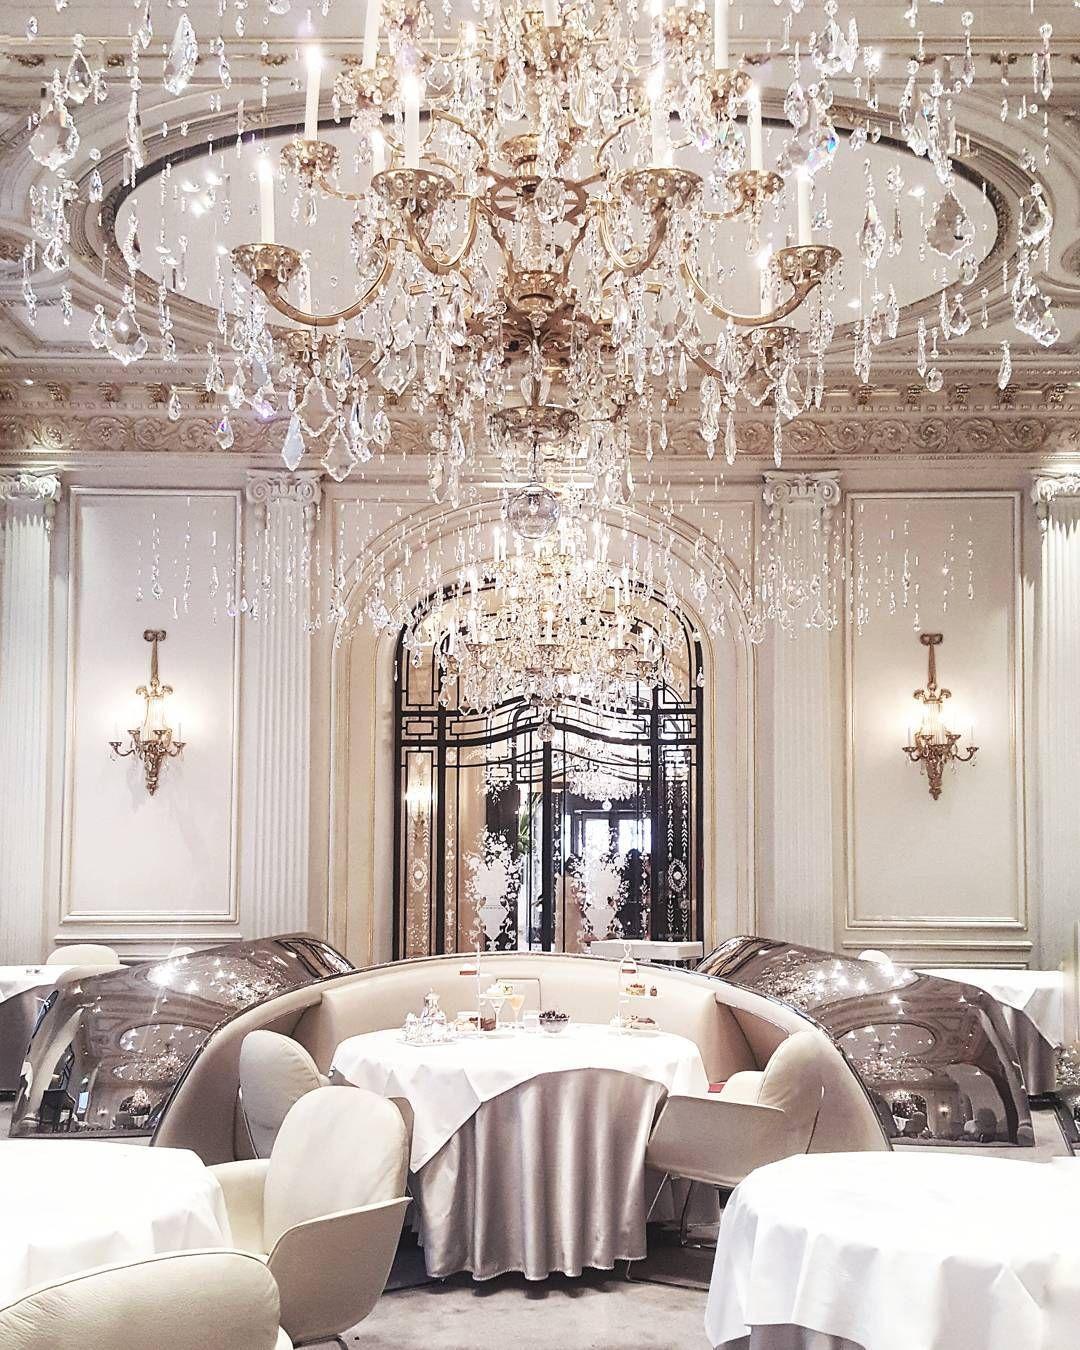 Luxe Pauvre | Hotel interior design, Architecture ...